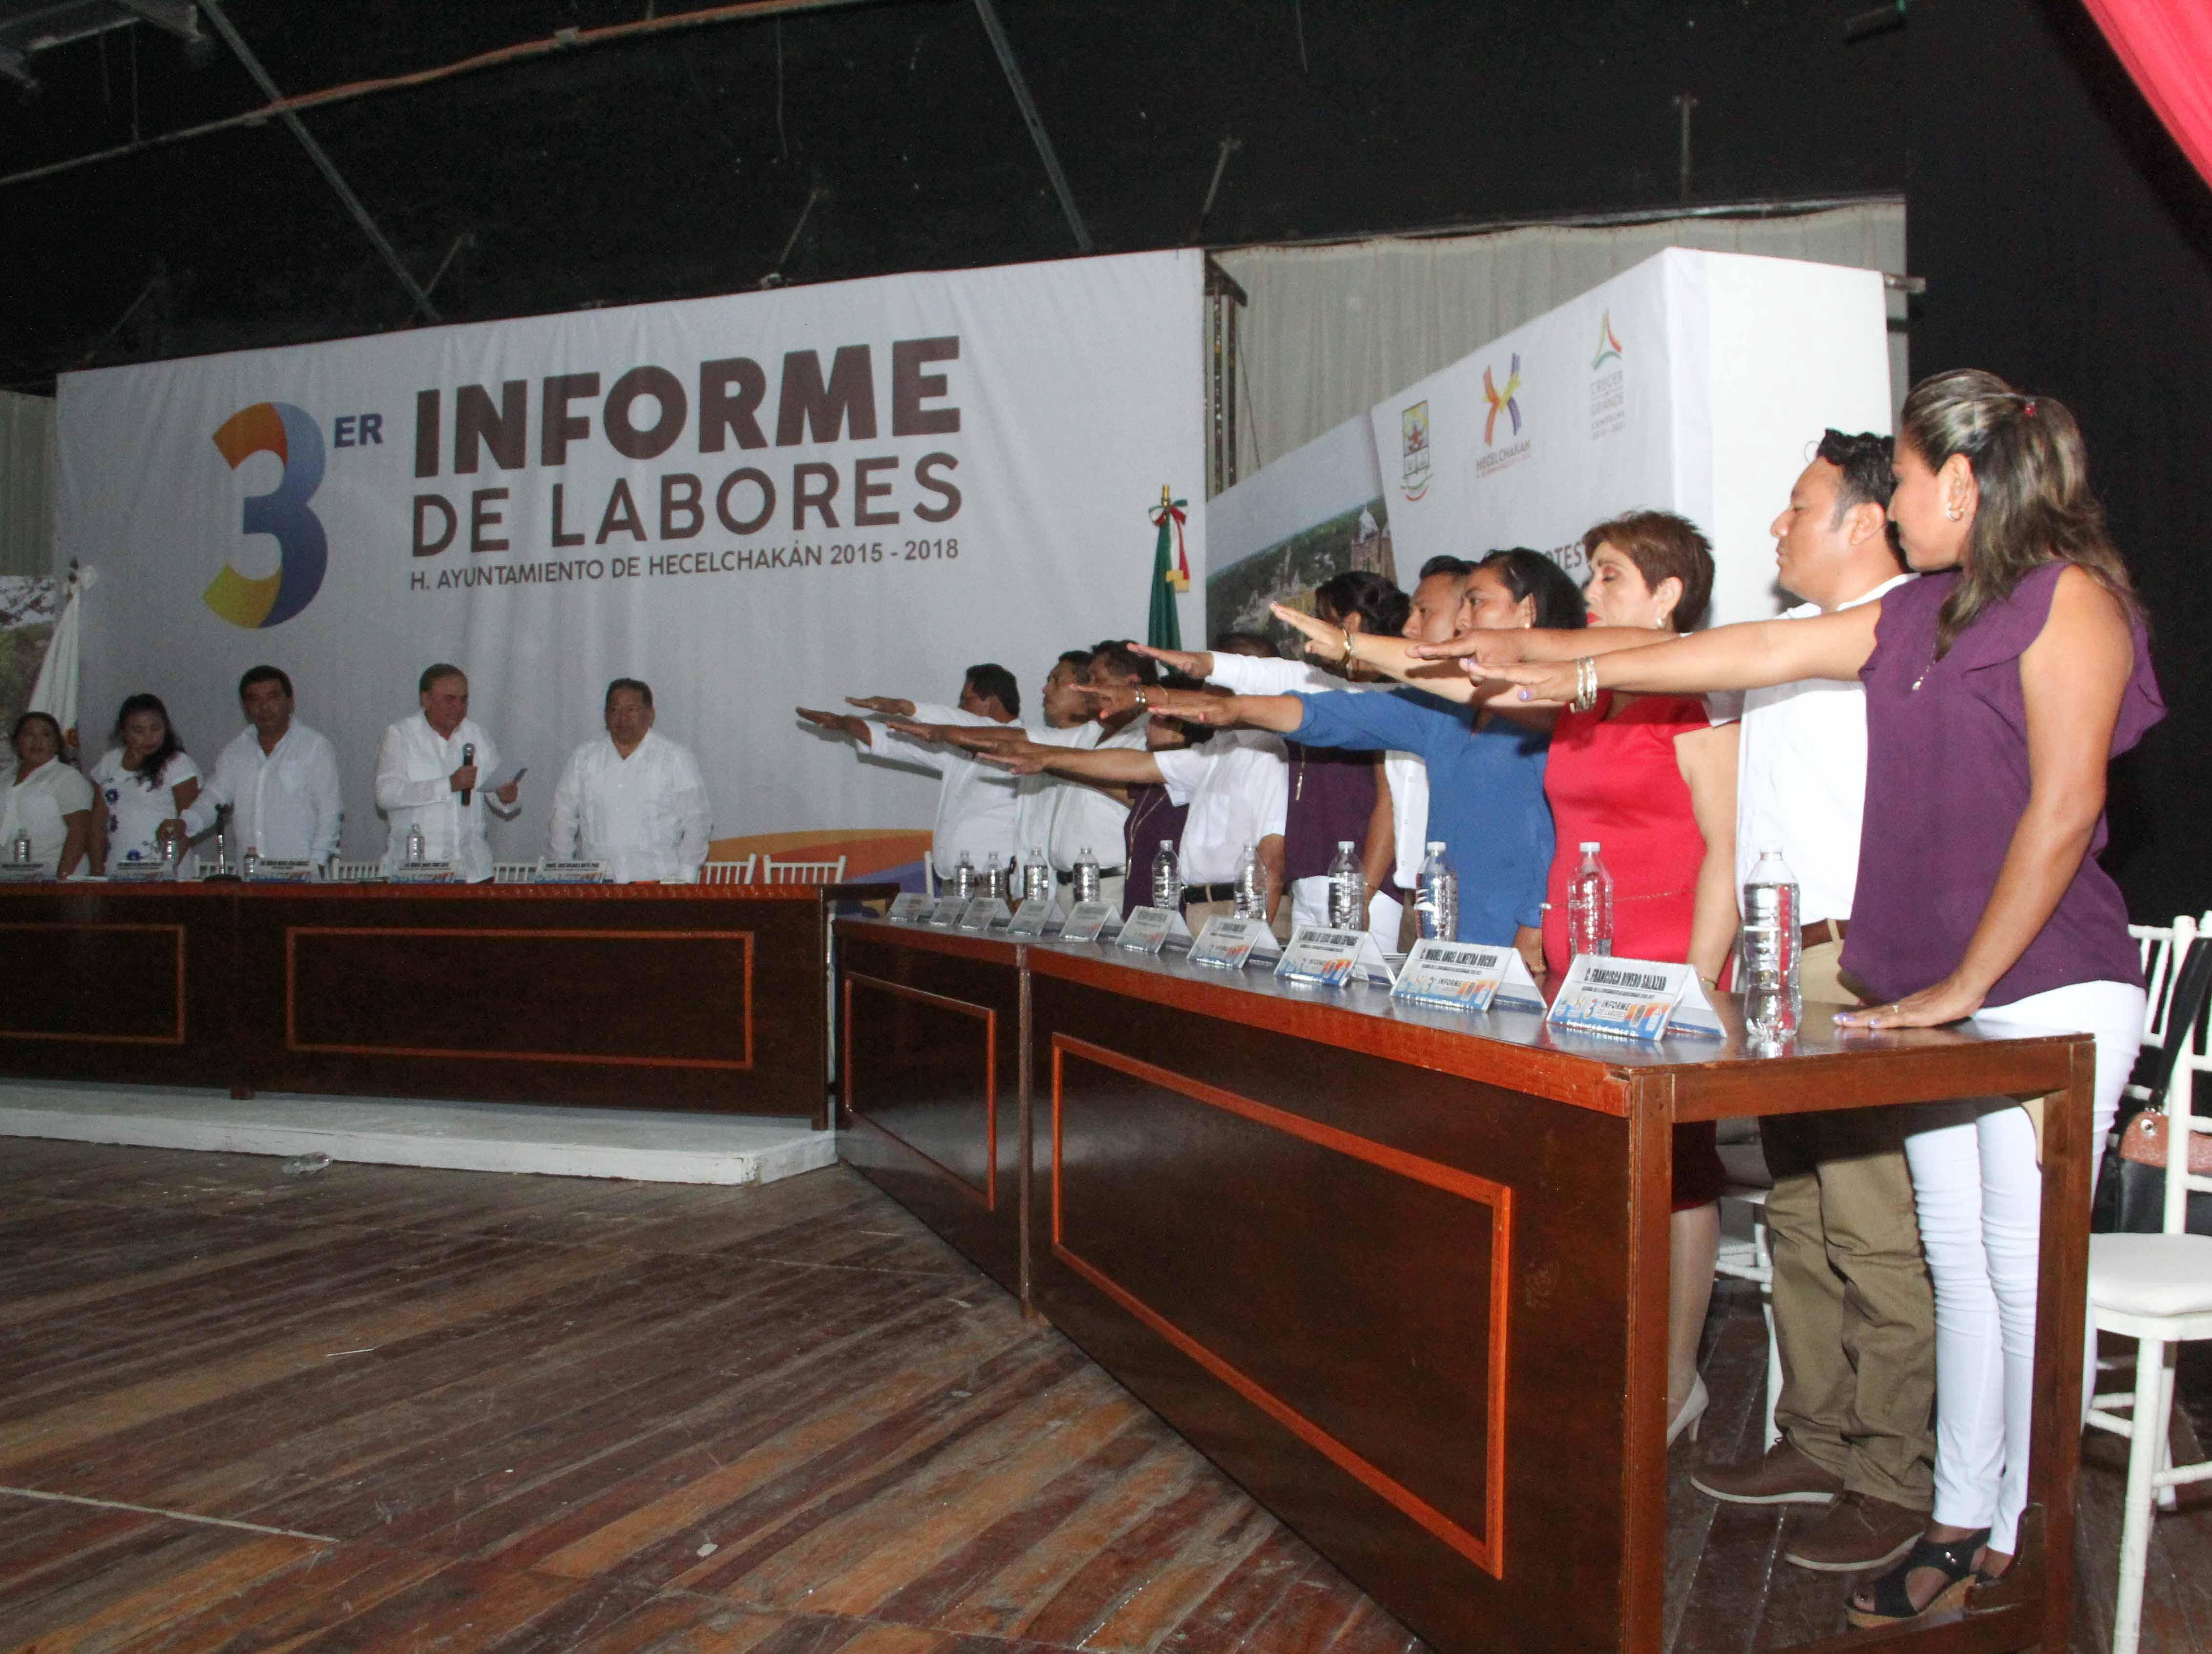 AYSA GONZÁLEZ TOMA PROTESTA A INTEGRANTES DEL CABILDO ELECTO DE HECELCHAKÁN